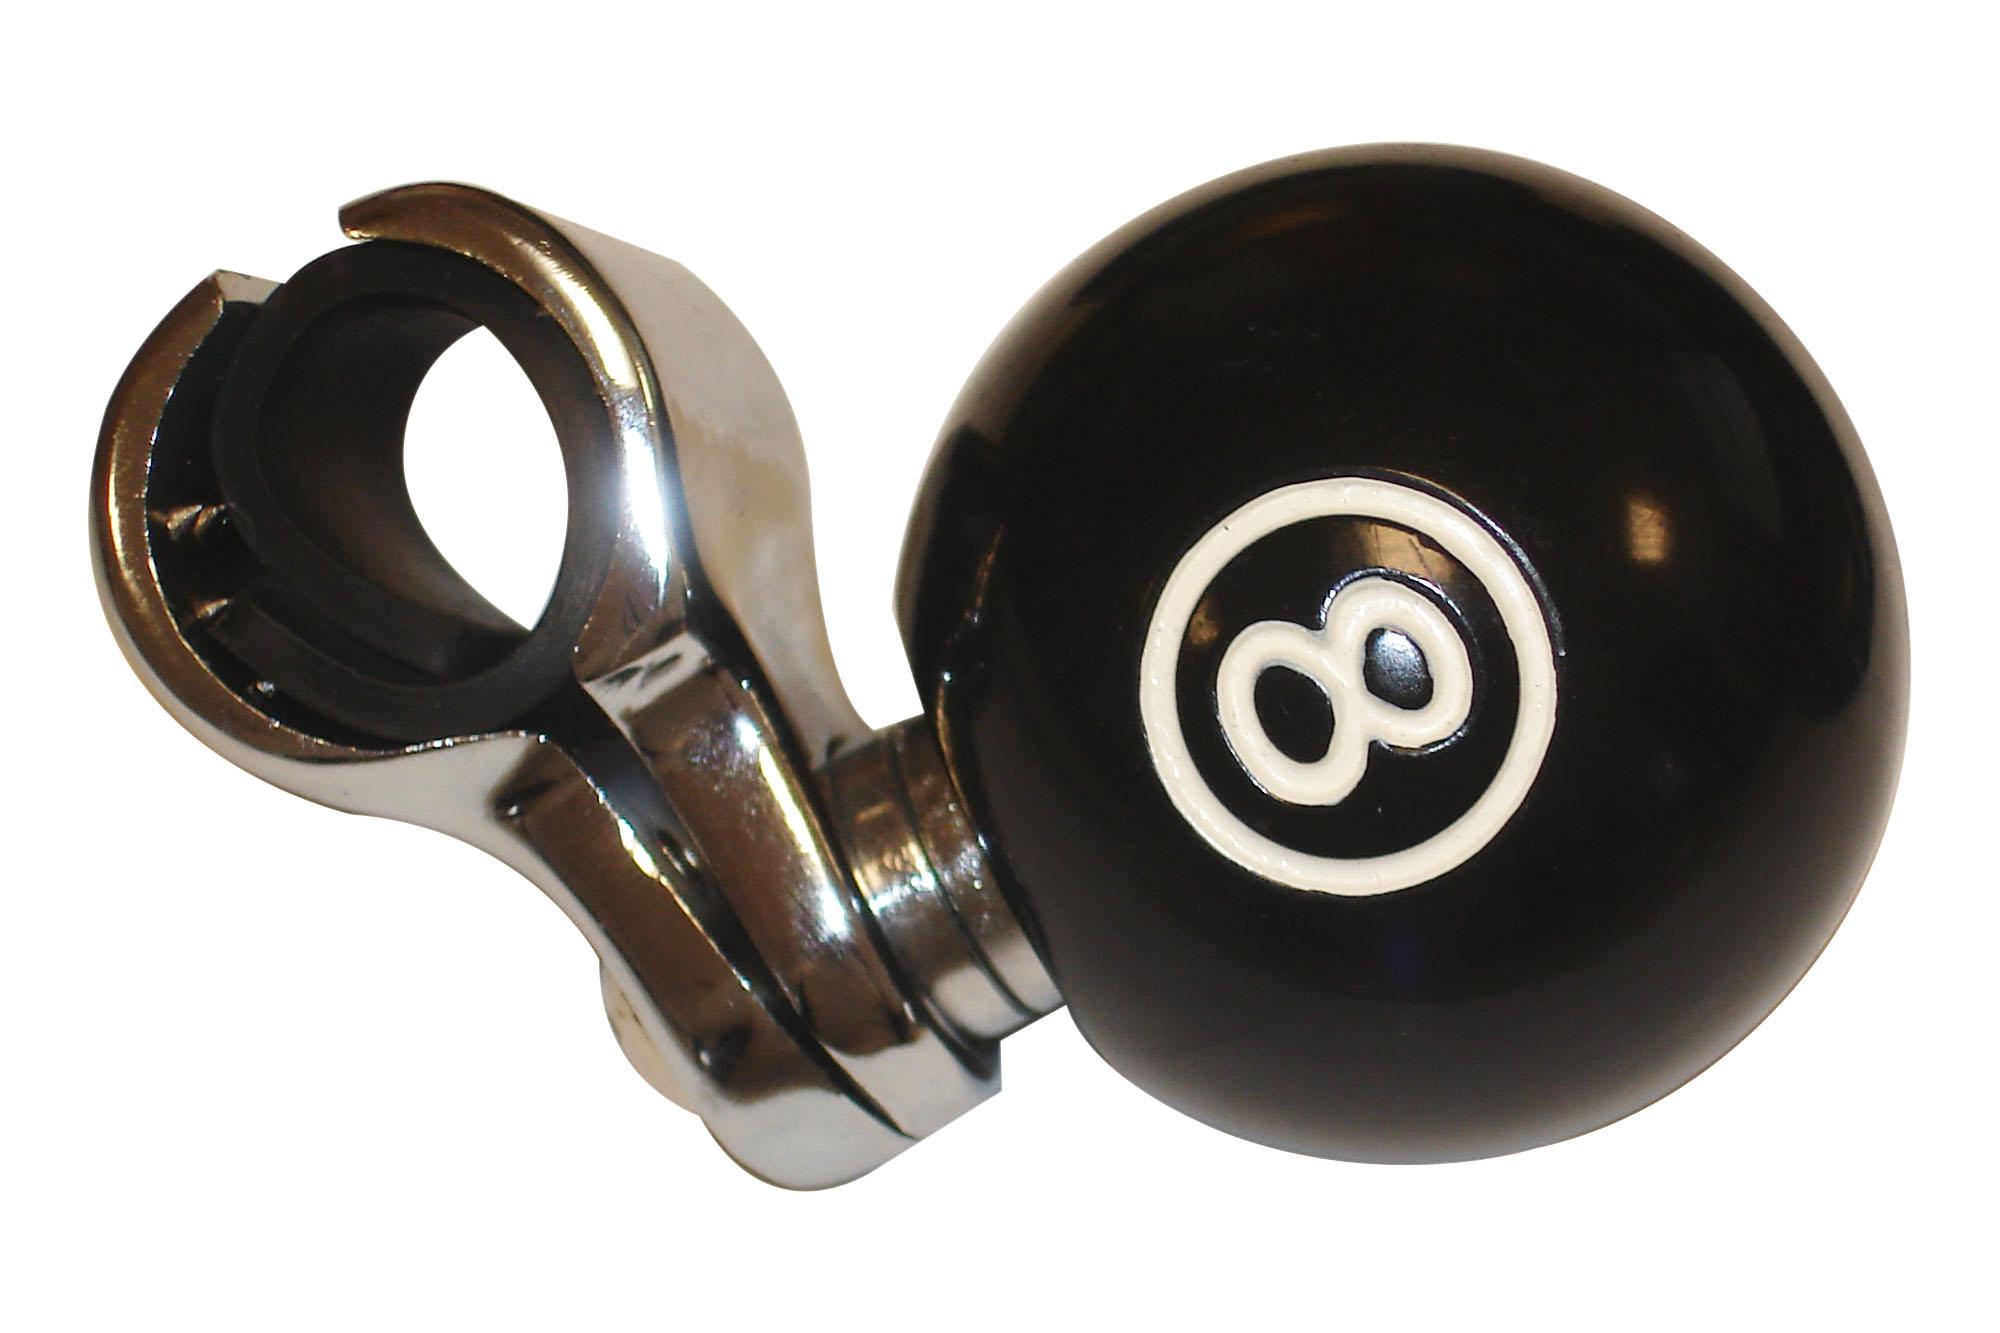 BLACK EIGHT BALL BILLIARDS POOL BALL KEYCHAIN novelty eightball key ring BALLS